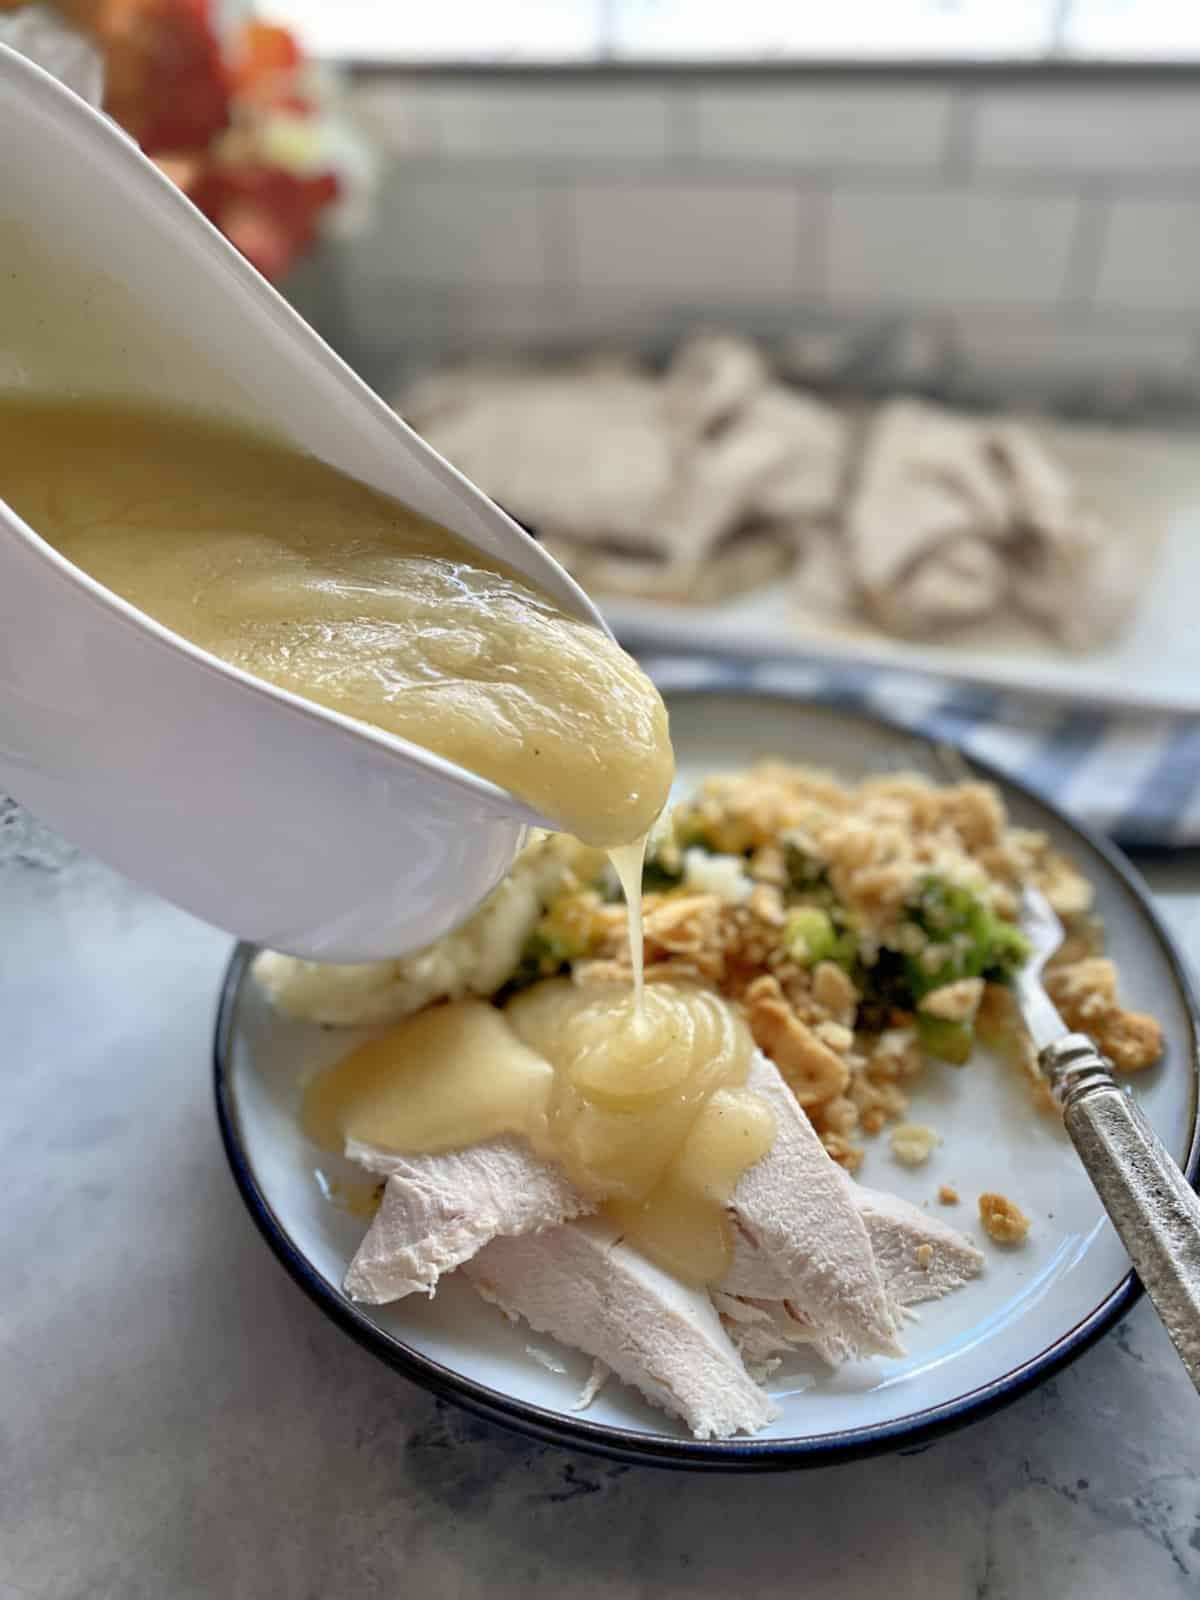 Gravy boat pouring gravy on top of sliced turkey breast.